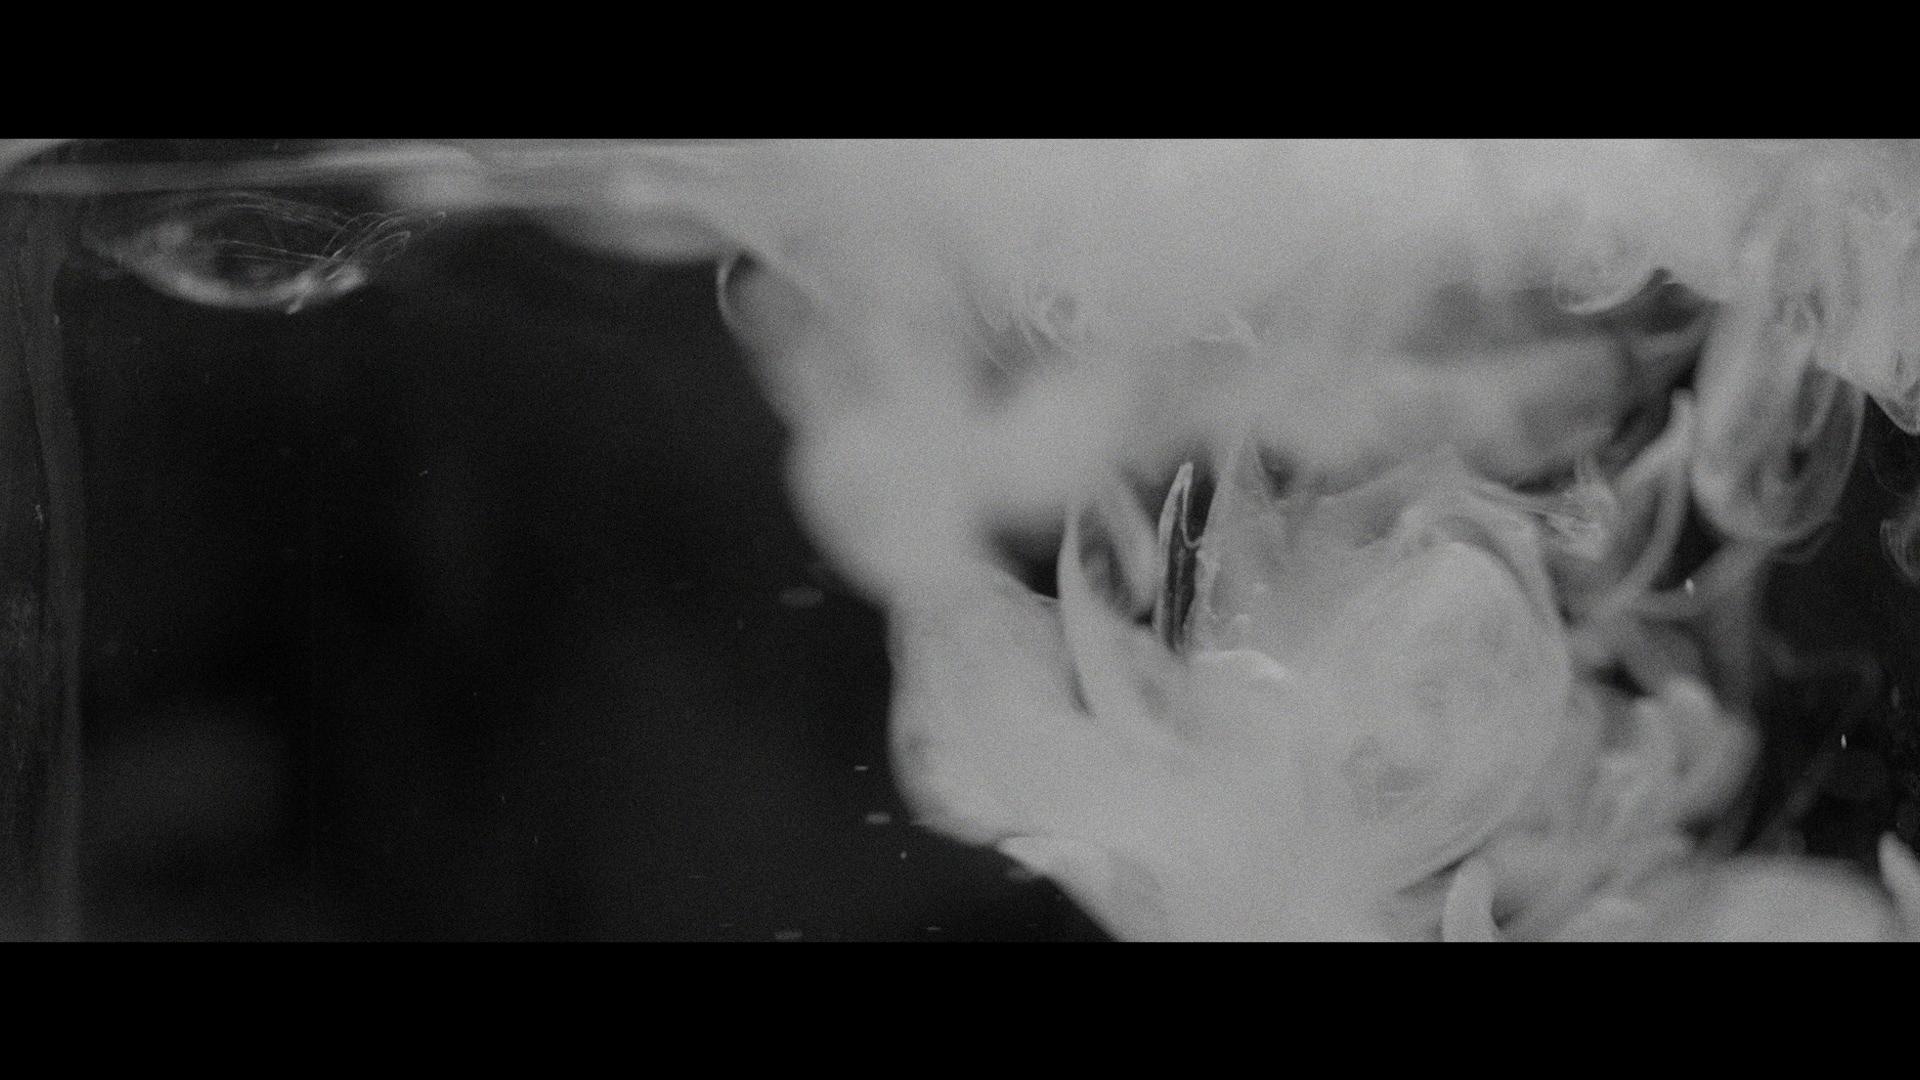 'I AM' Series Promo